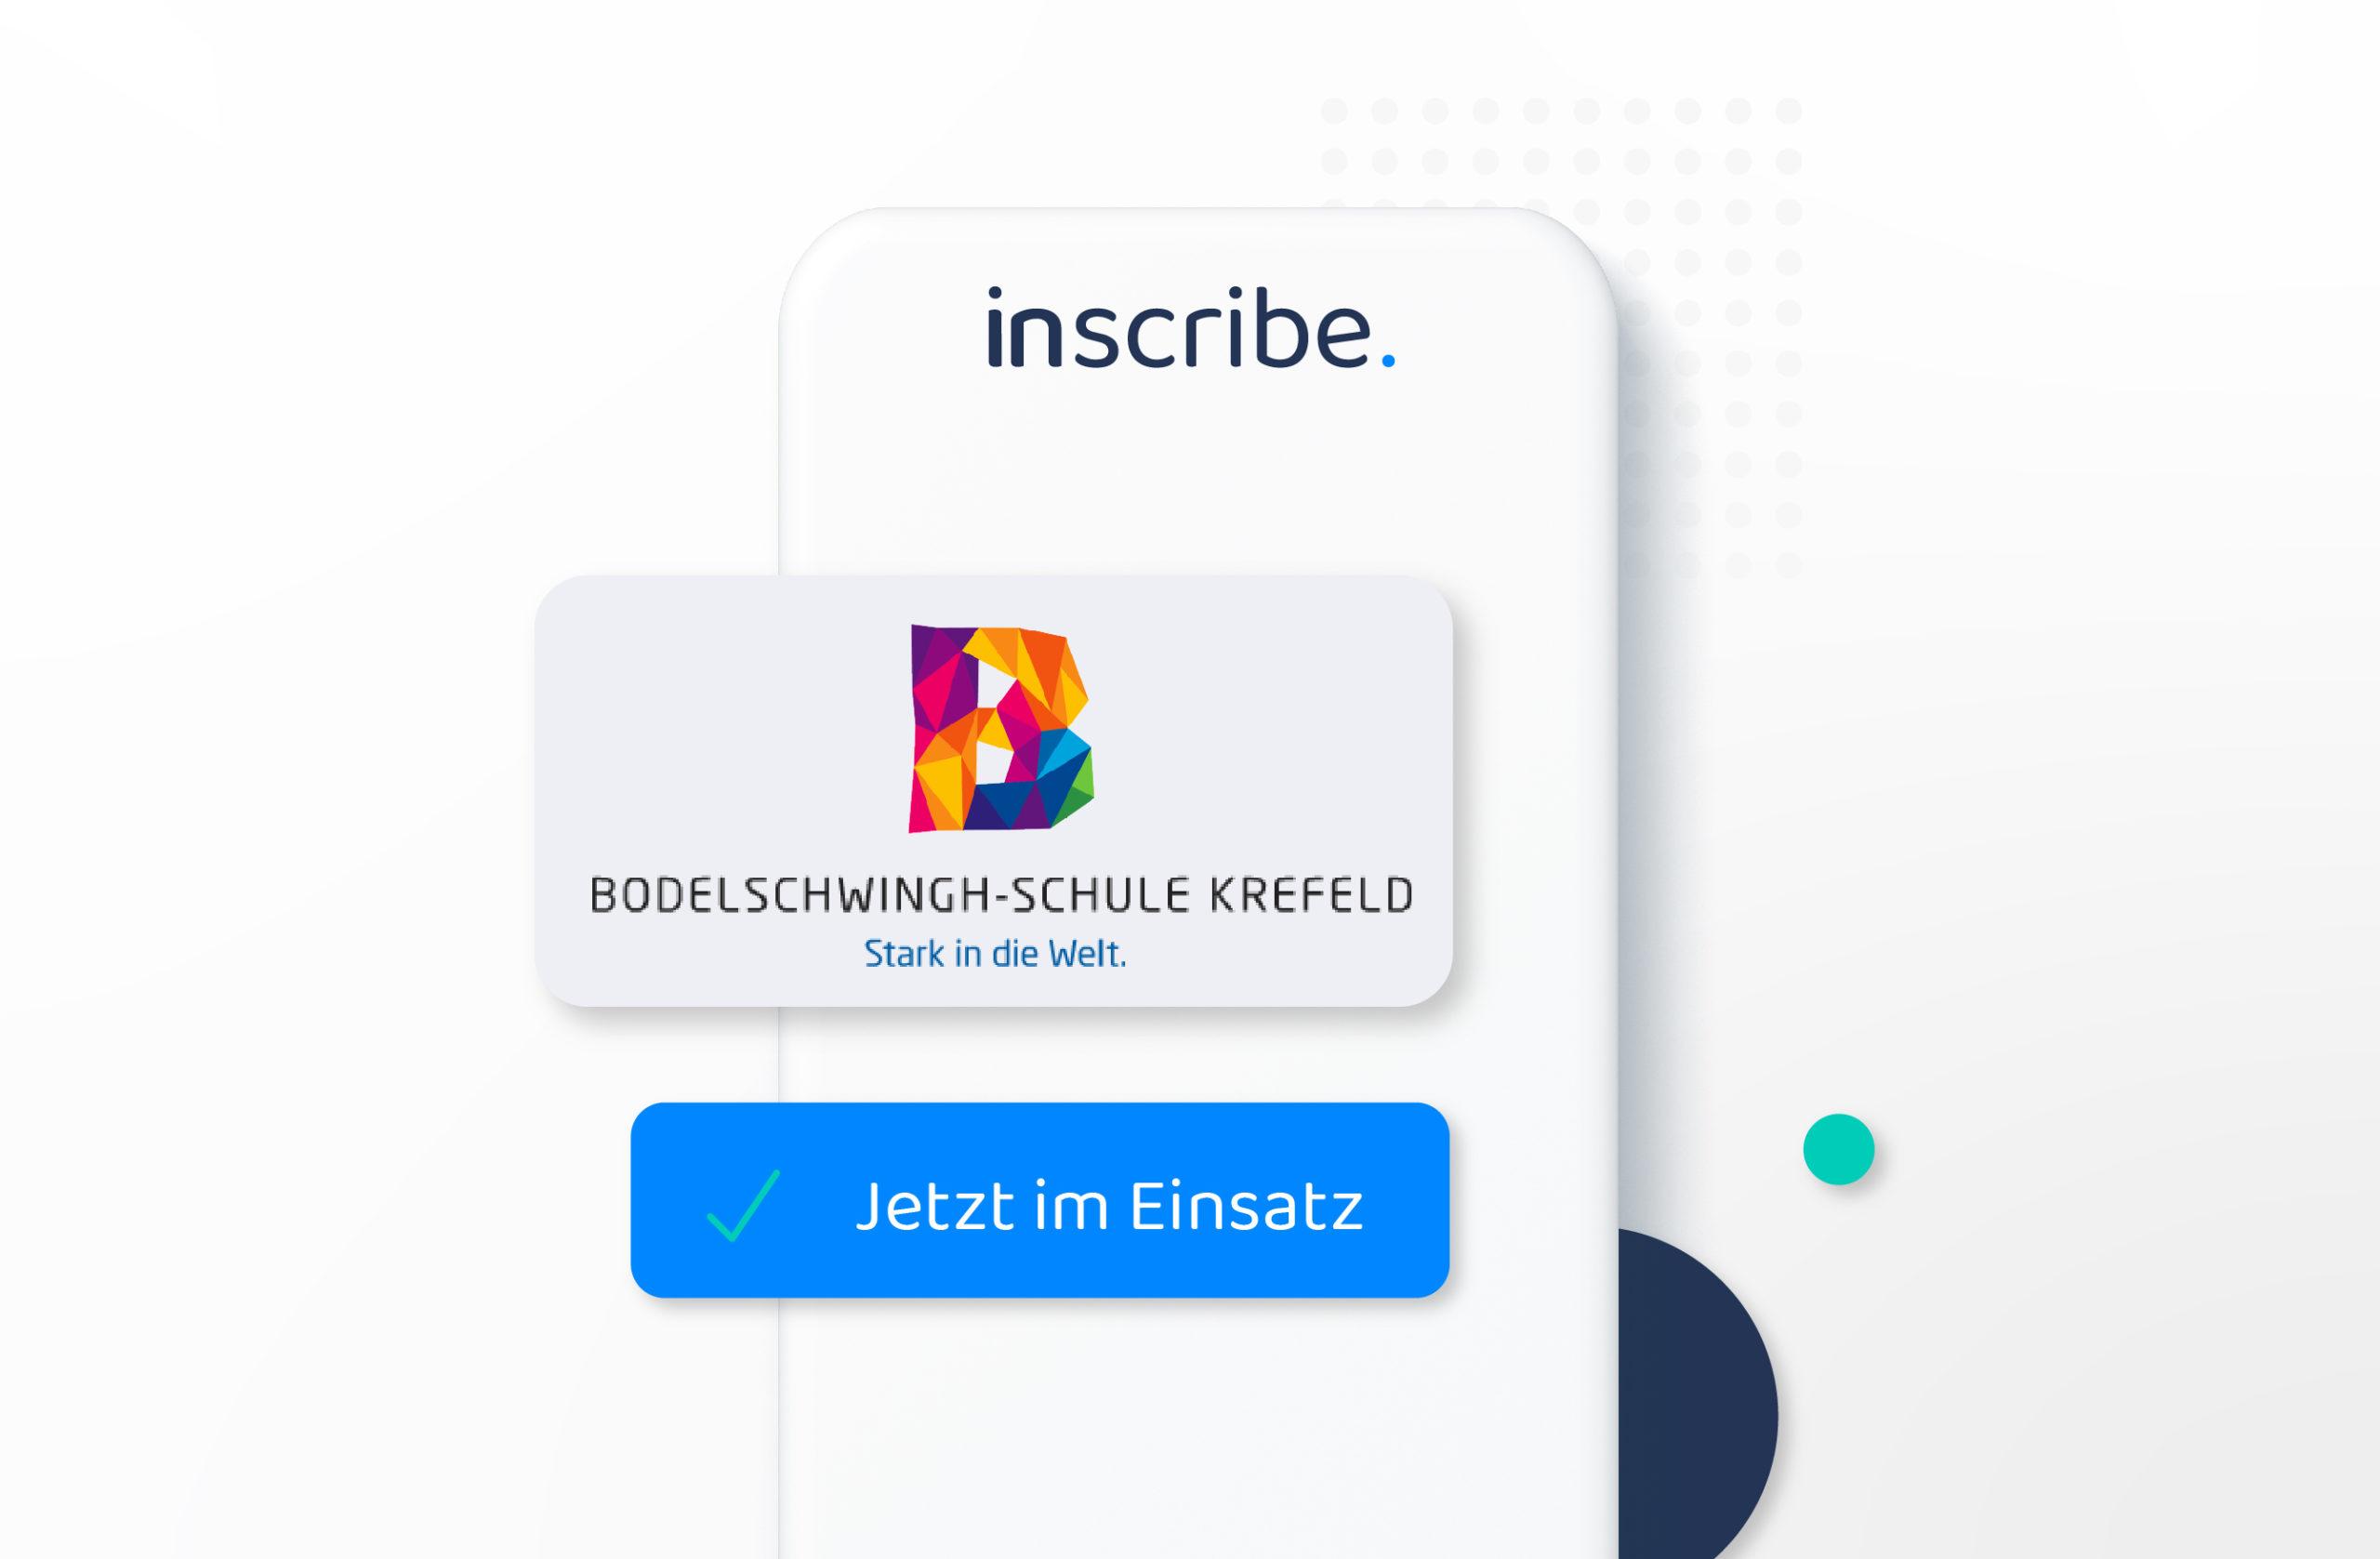 Digital attendance list Inscribe in use at Bodelschwingh School